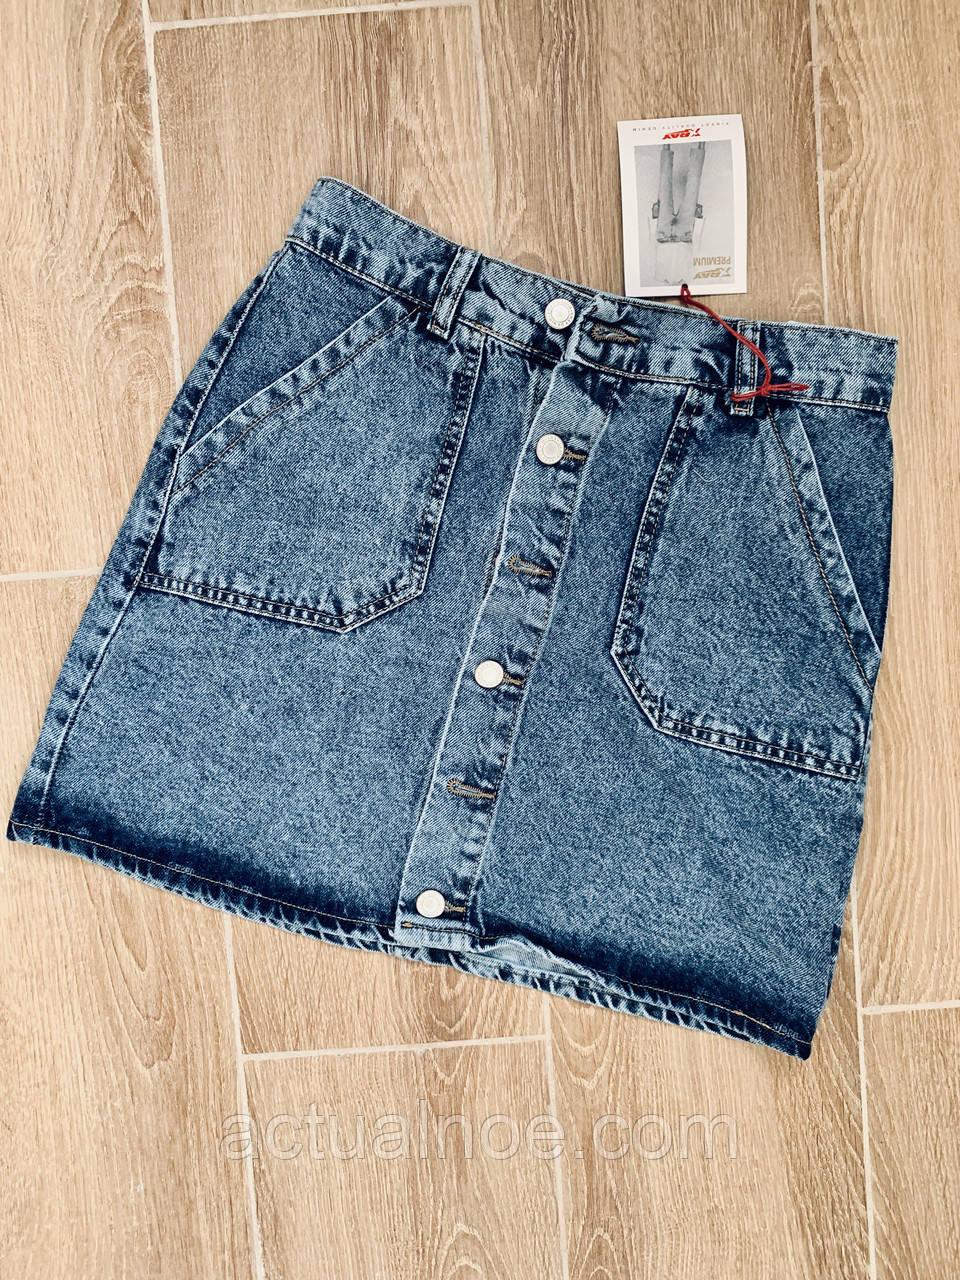 b7bc1efa01a4 Юбка джинсовая мини на пуговицах варёнка